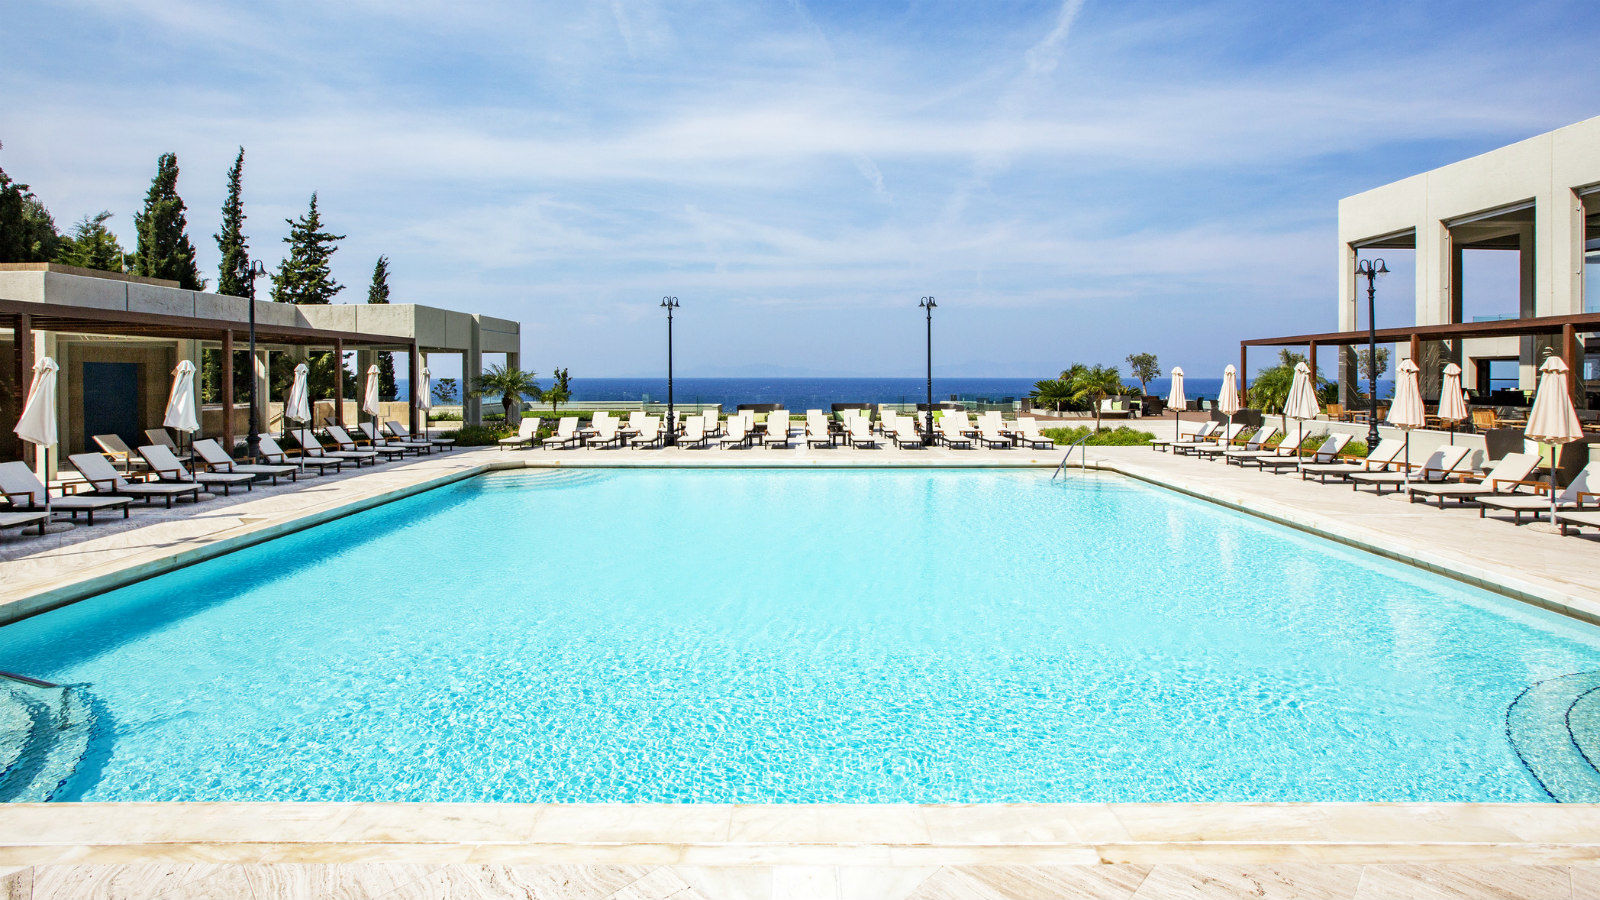 Sheraton rhodes resort direct rhodes for Swimming pool resort in gensan